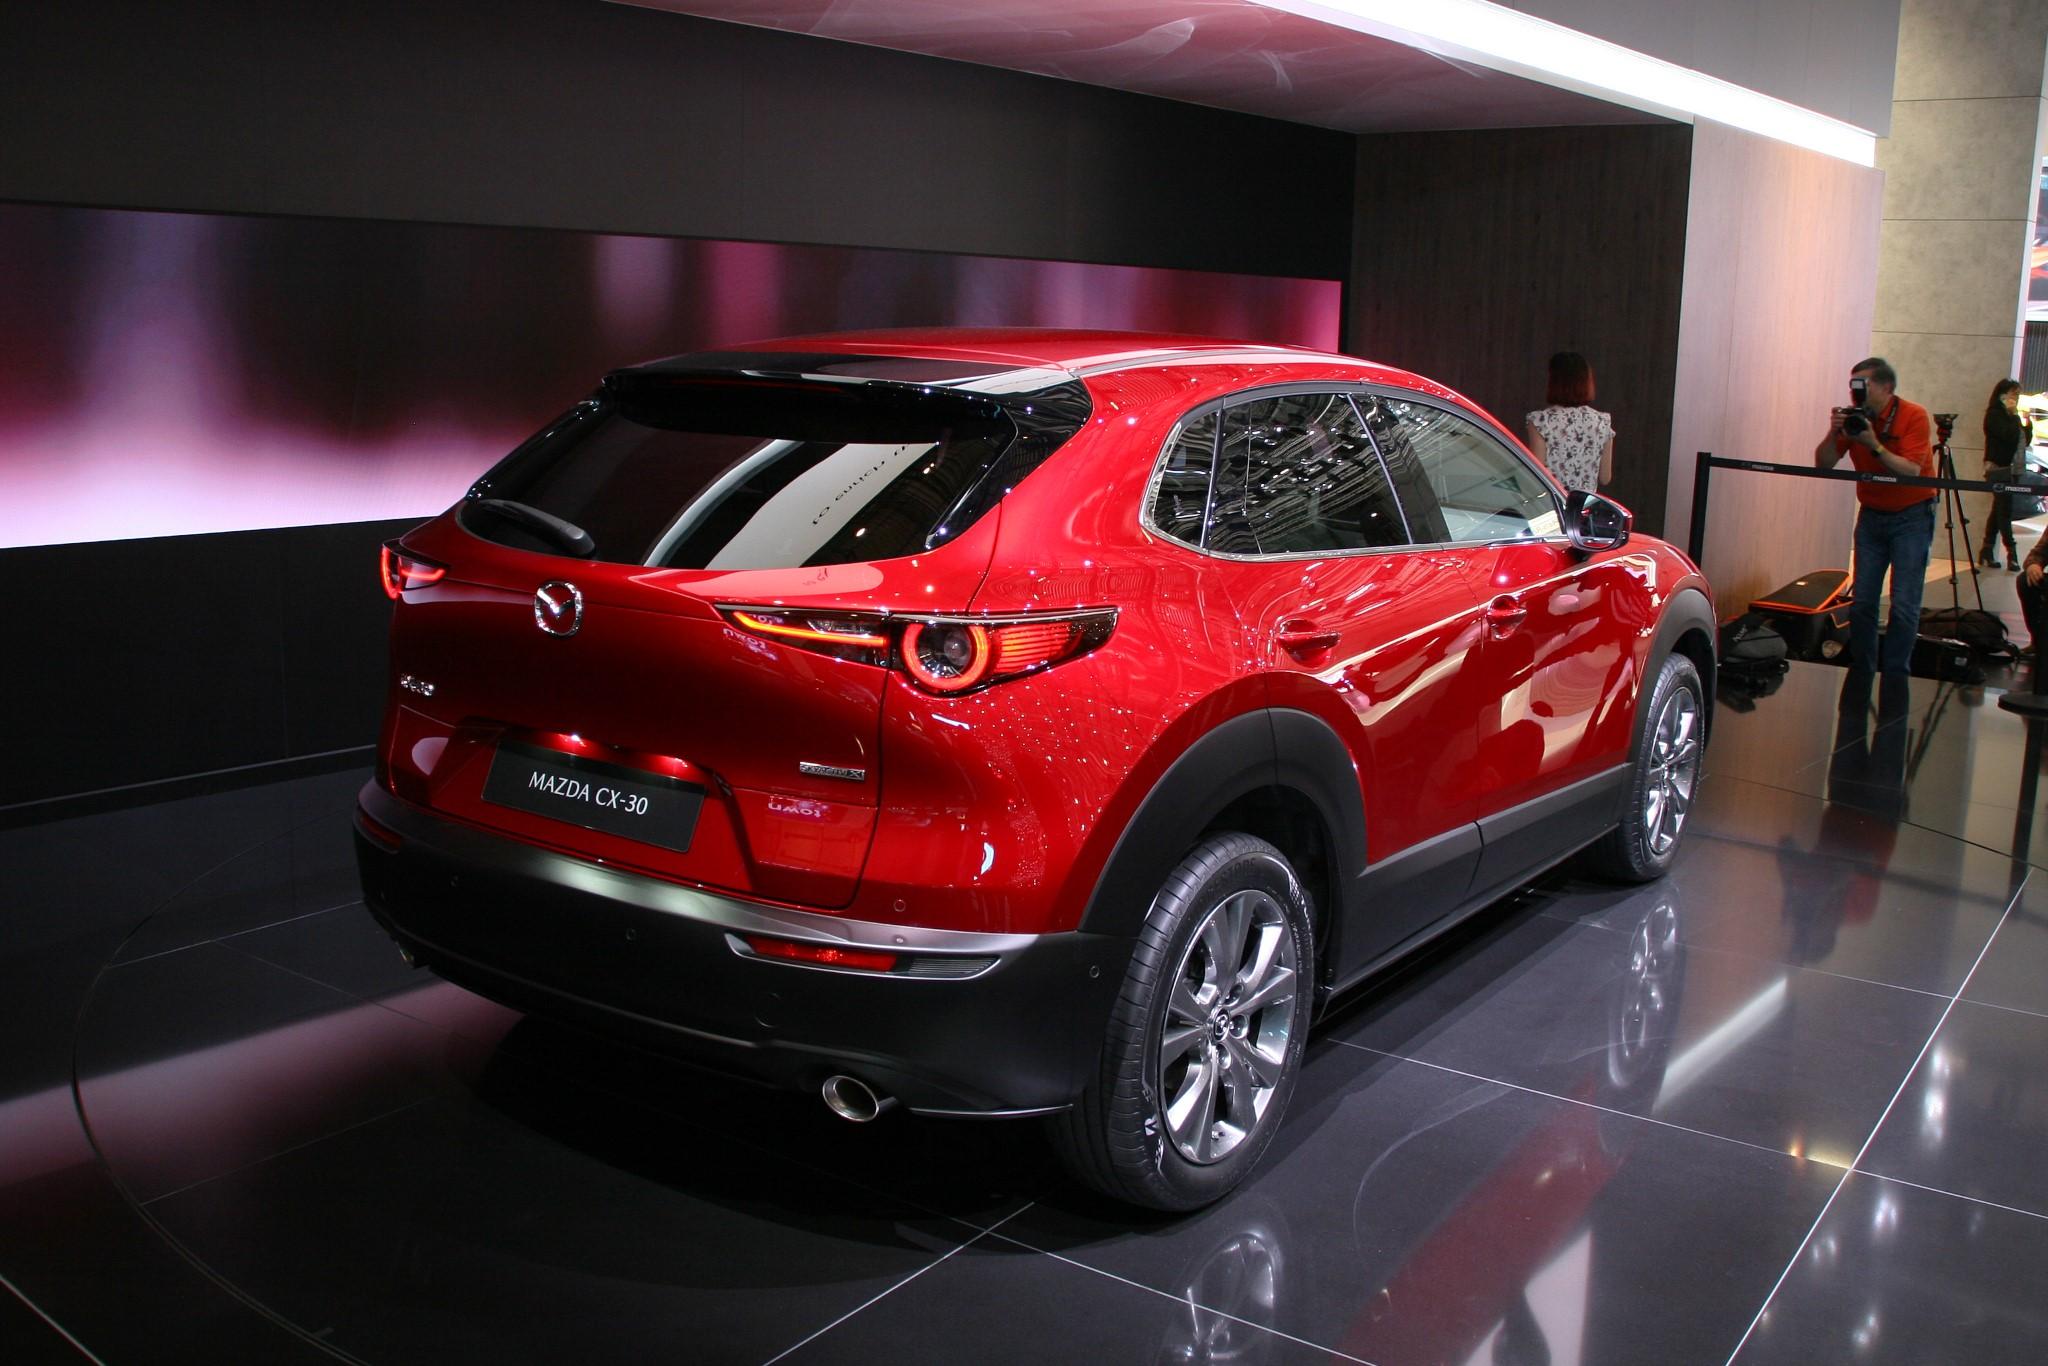 Mazda CX-30 Genfi Autószalon 2019